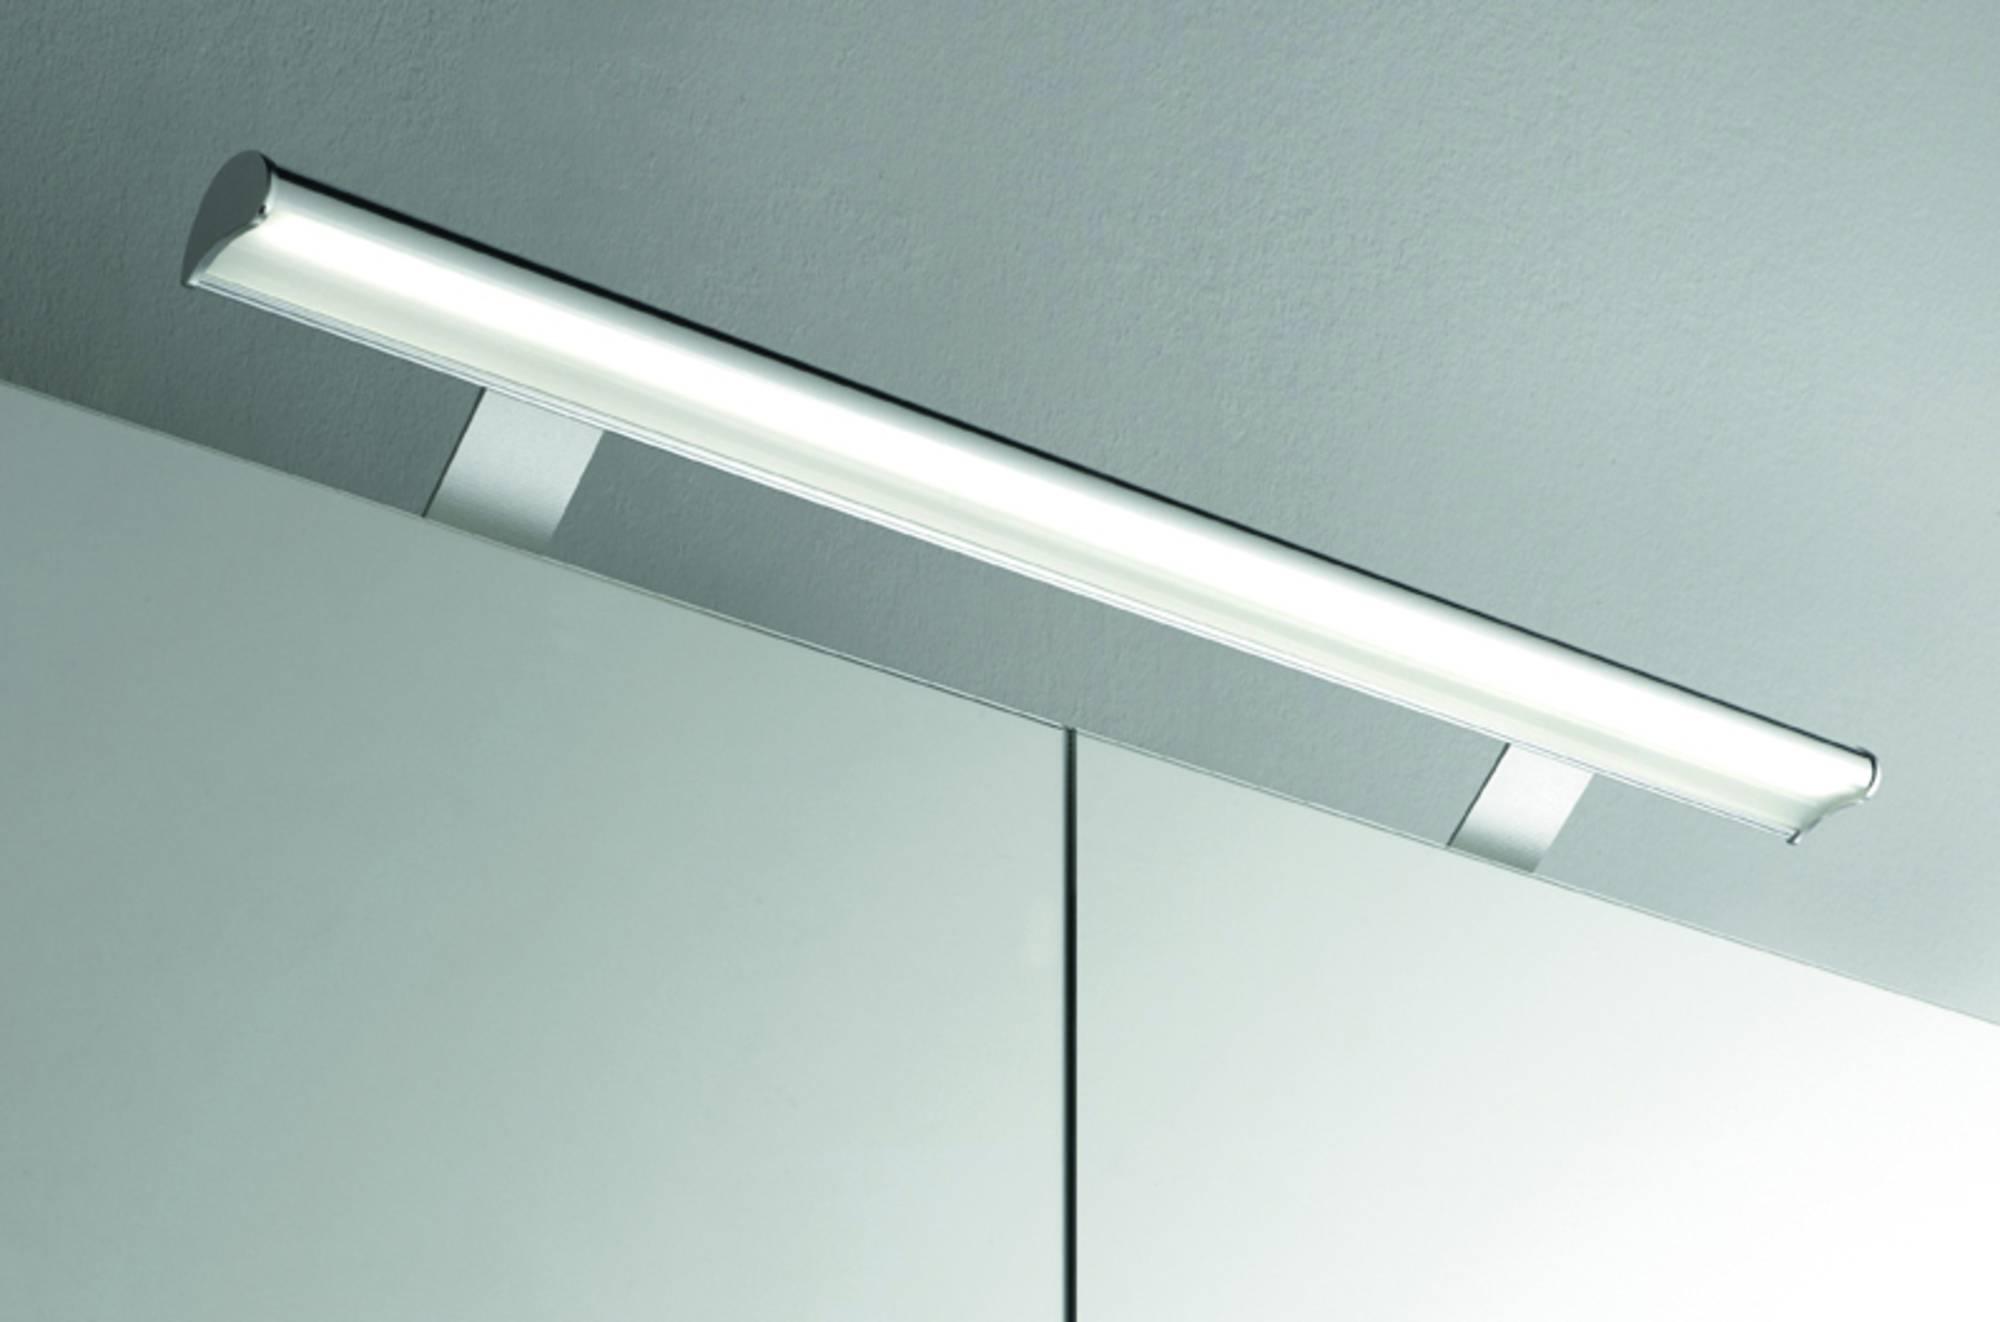 Thebalux Libra LED lamp 80 cm